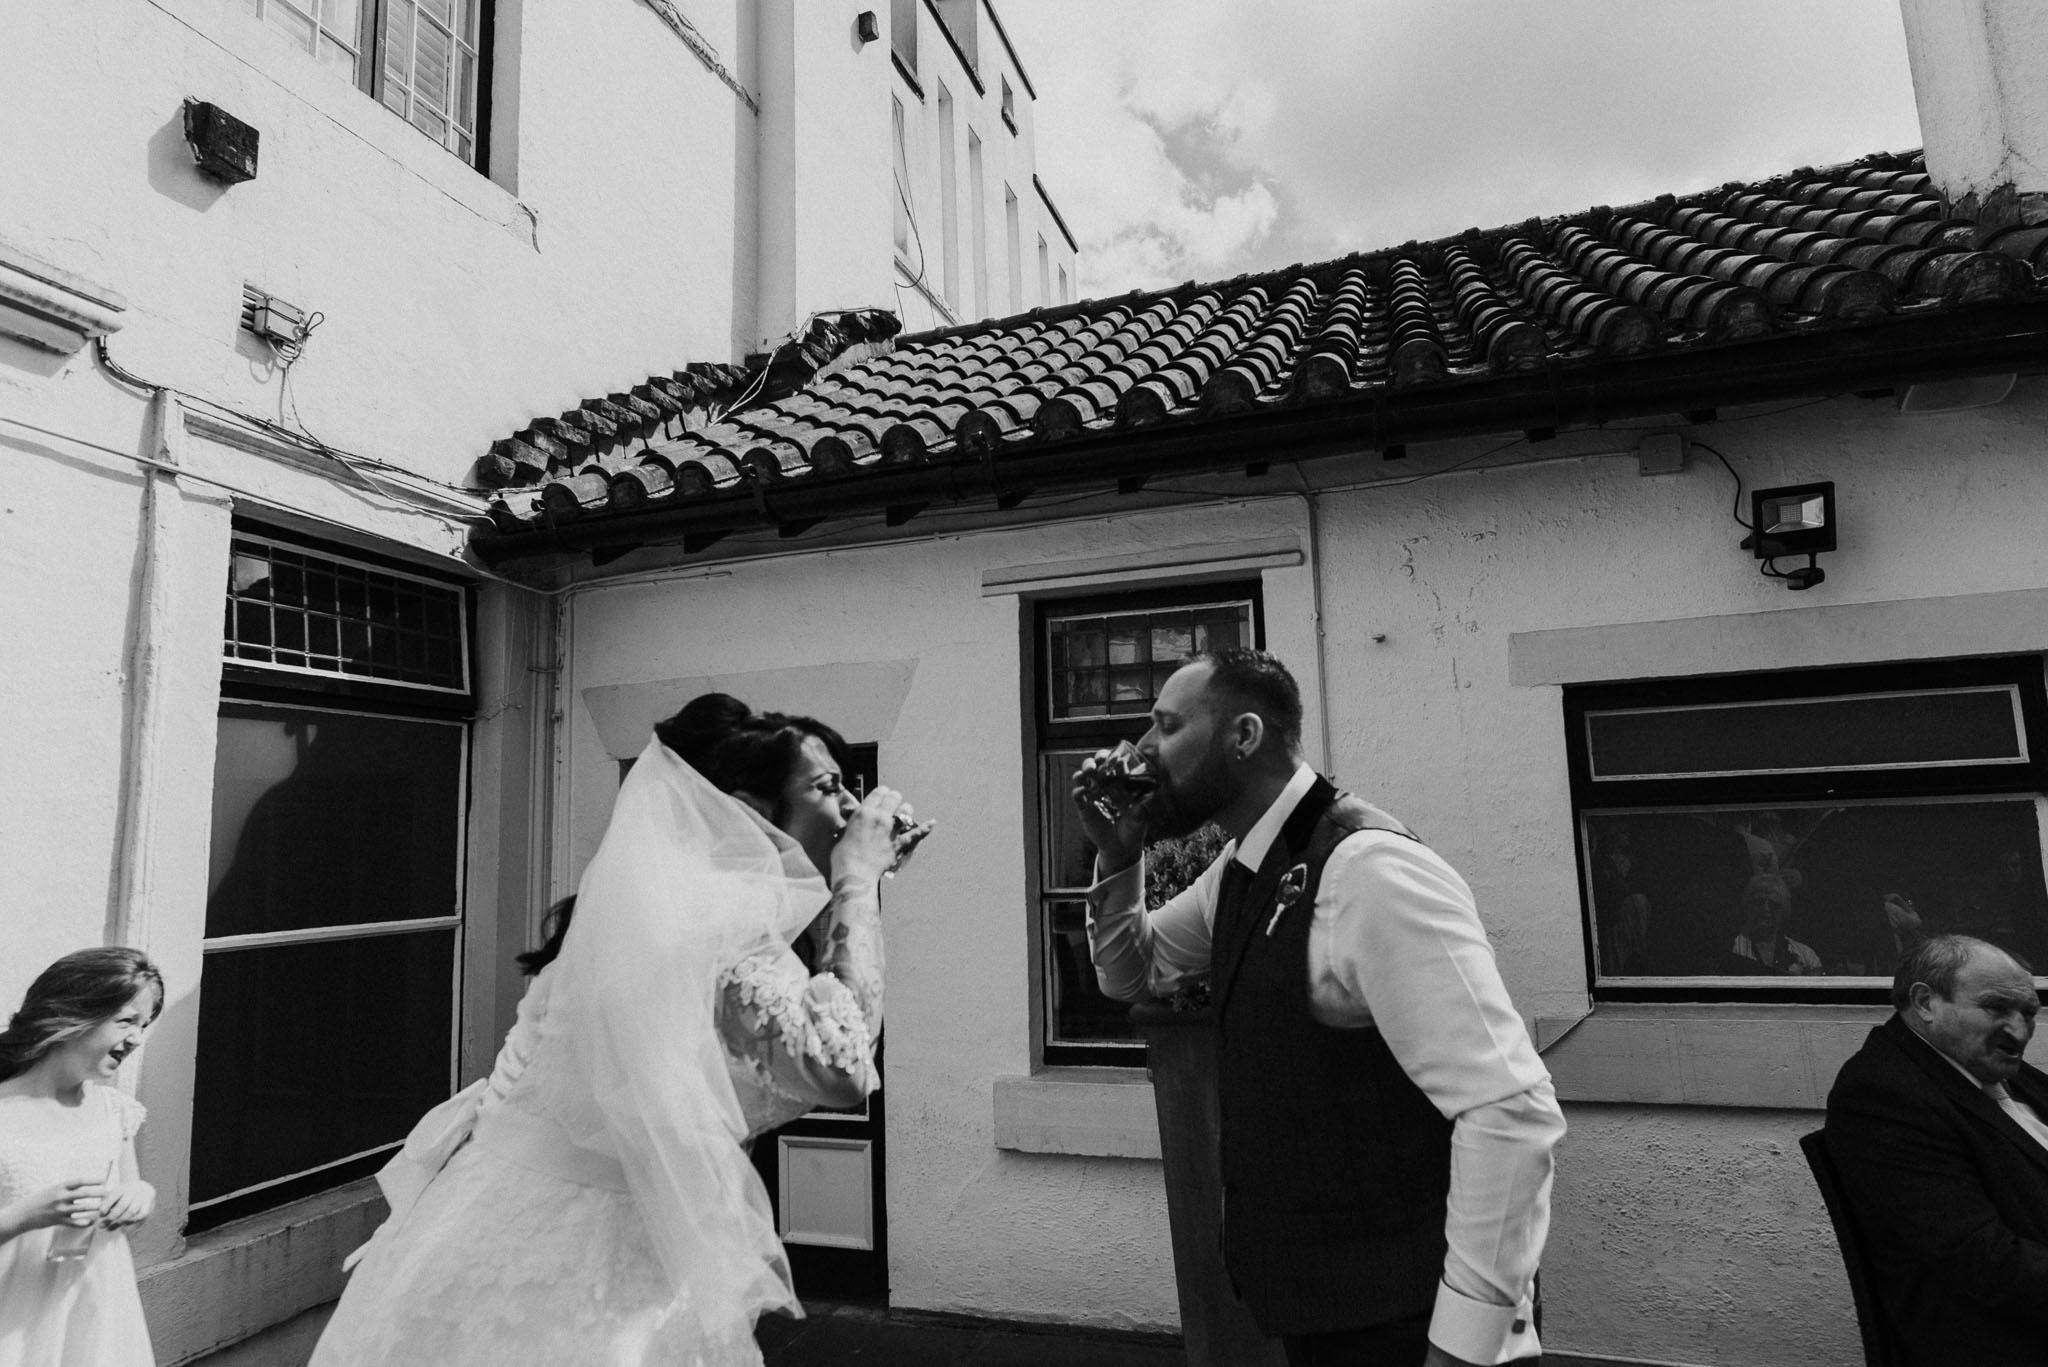 fun-wedding-photography-at-the-belle-epoque-knutsford-wedding-photographer (2).jpg